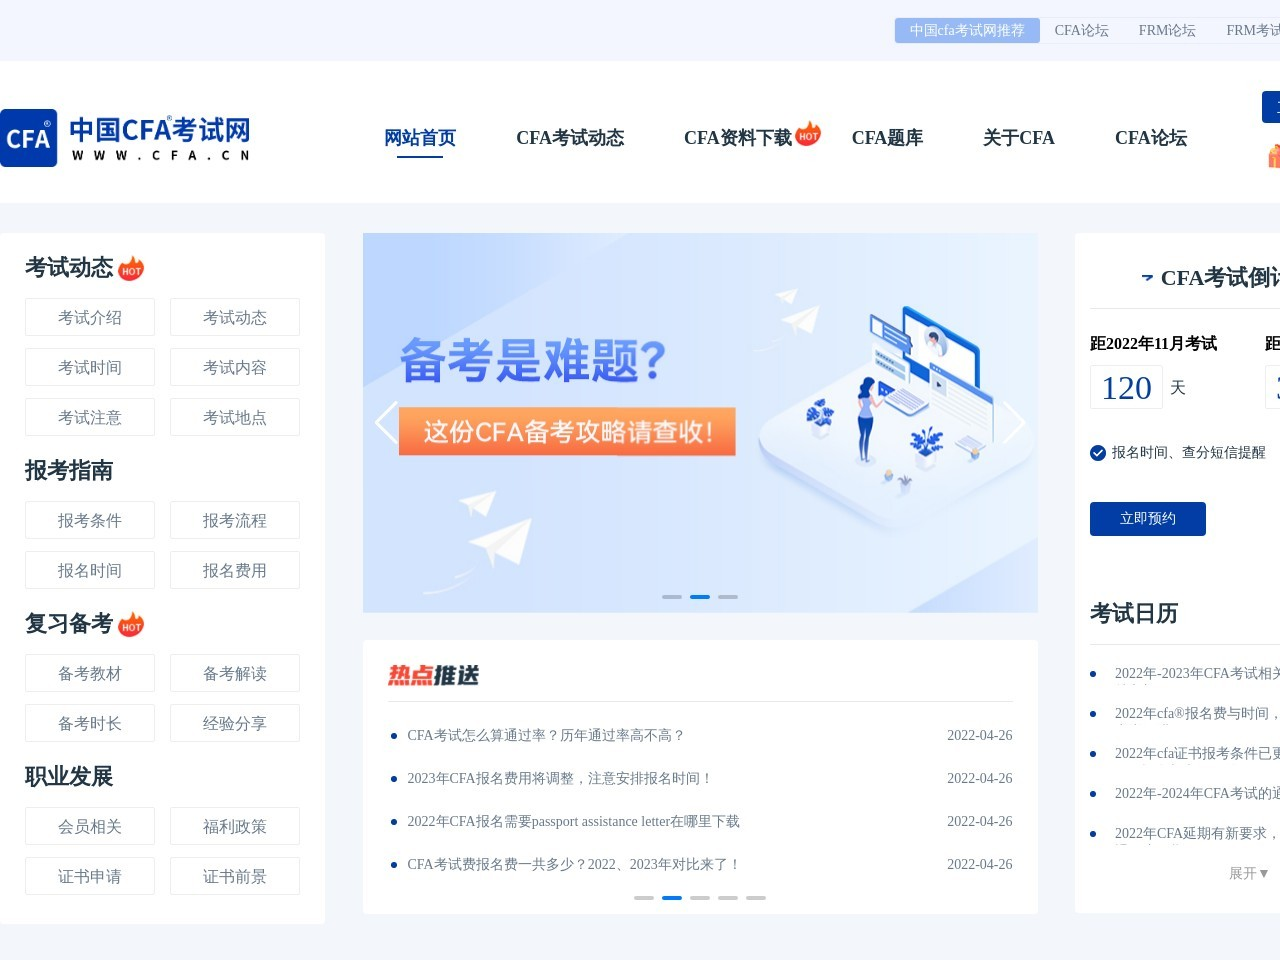 中国CFA考试网_CFA,CFA考试,CFA报名